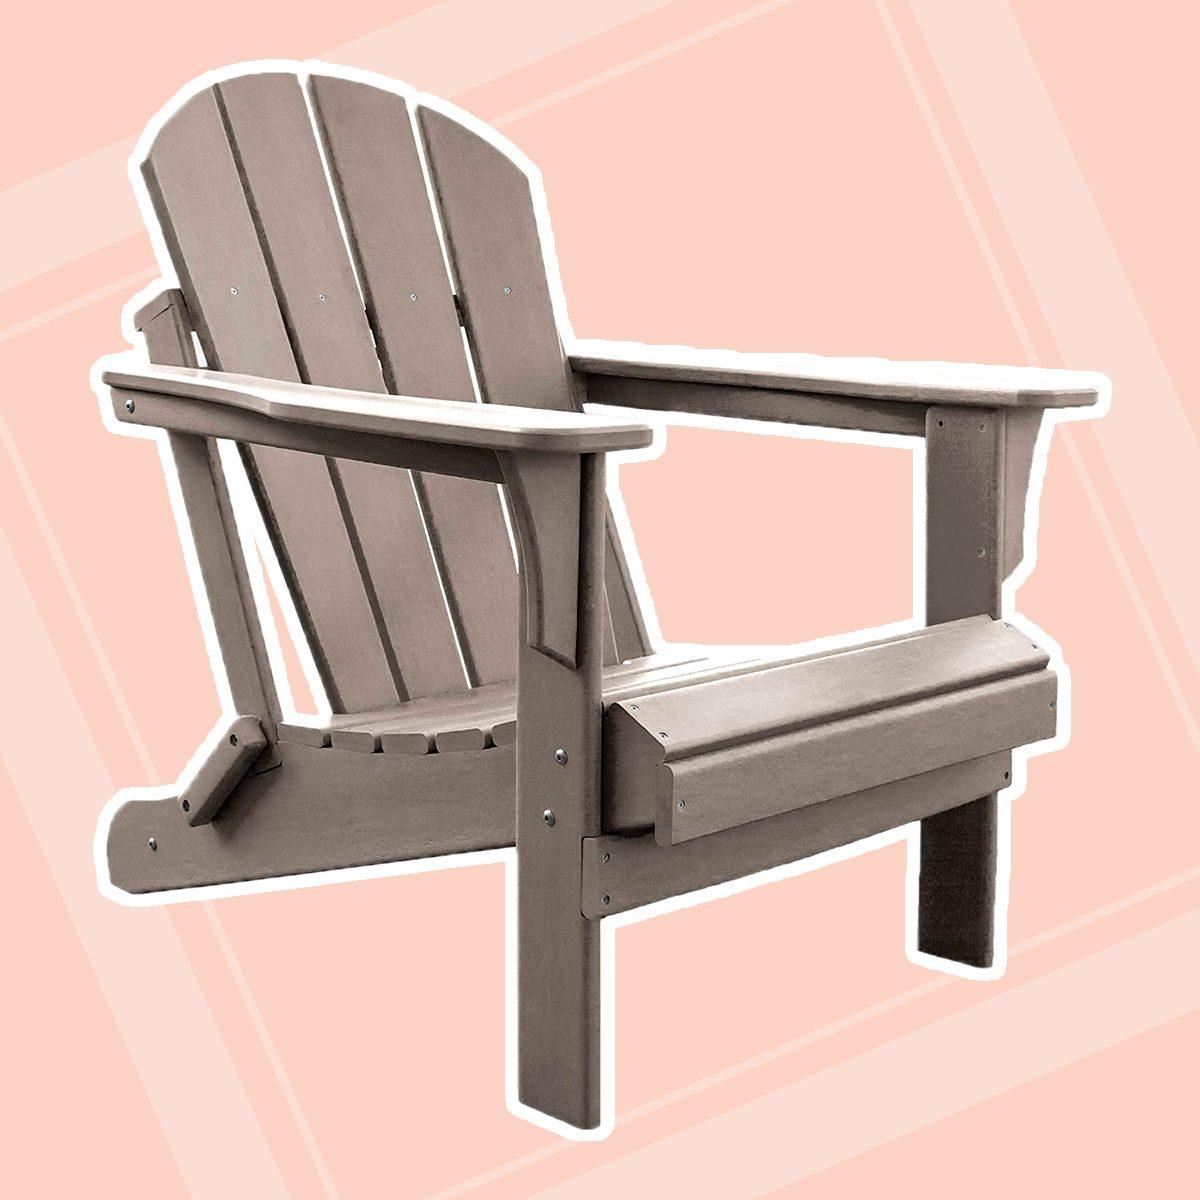 Panama Jack PJO-4001-TAUPE Adirondack Chair, Taupe